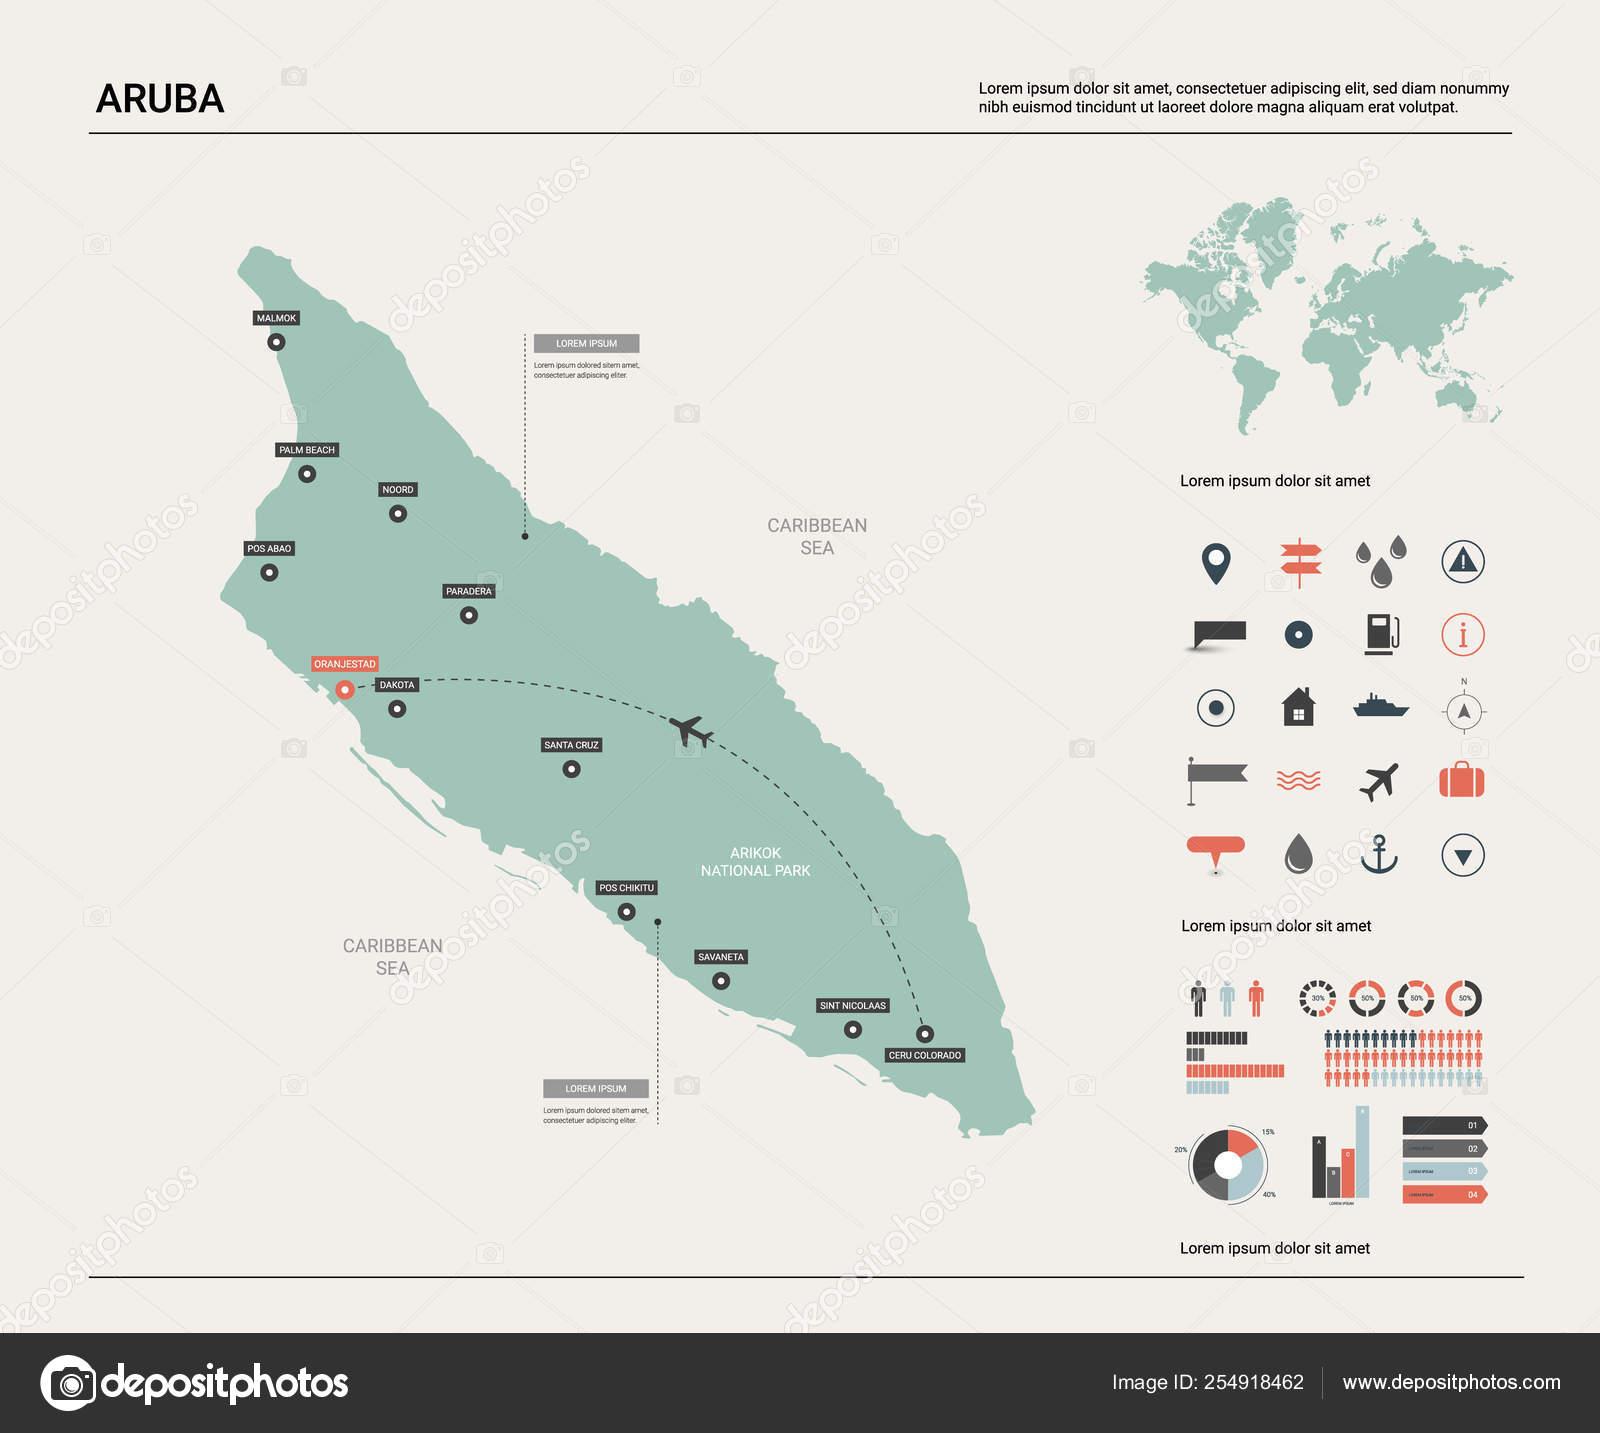 Vector map of Aruba. — Stock Vector © molokowall #254918462 on tunisia map, cameroon map, greater antilles map, angola map, st. thomas map, virgin islands map, saba map, santa barbara map, libya map, jamaica map, korea map, mexico map, eritrea map, carribean map, madagascar map, netherlands map, senegal map, mozambique map, united states map, antigua map, lesotho map, algeria map, caribbean map, st. martin map, namibia map, dominican republic map, kenya map, burundi map, sudan map, puerto rico map, ghana map, ethiopia map, rwanda map, zimbabwe map, morocco map, peru map, egypt map, niger map,